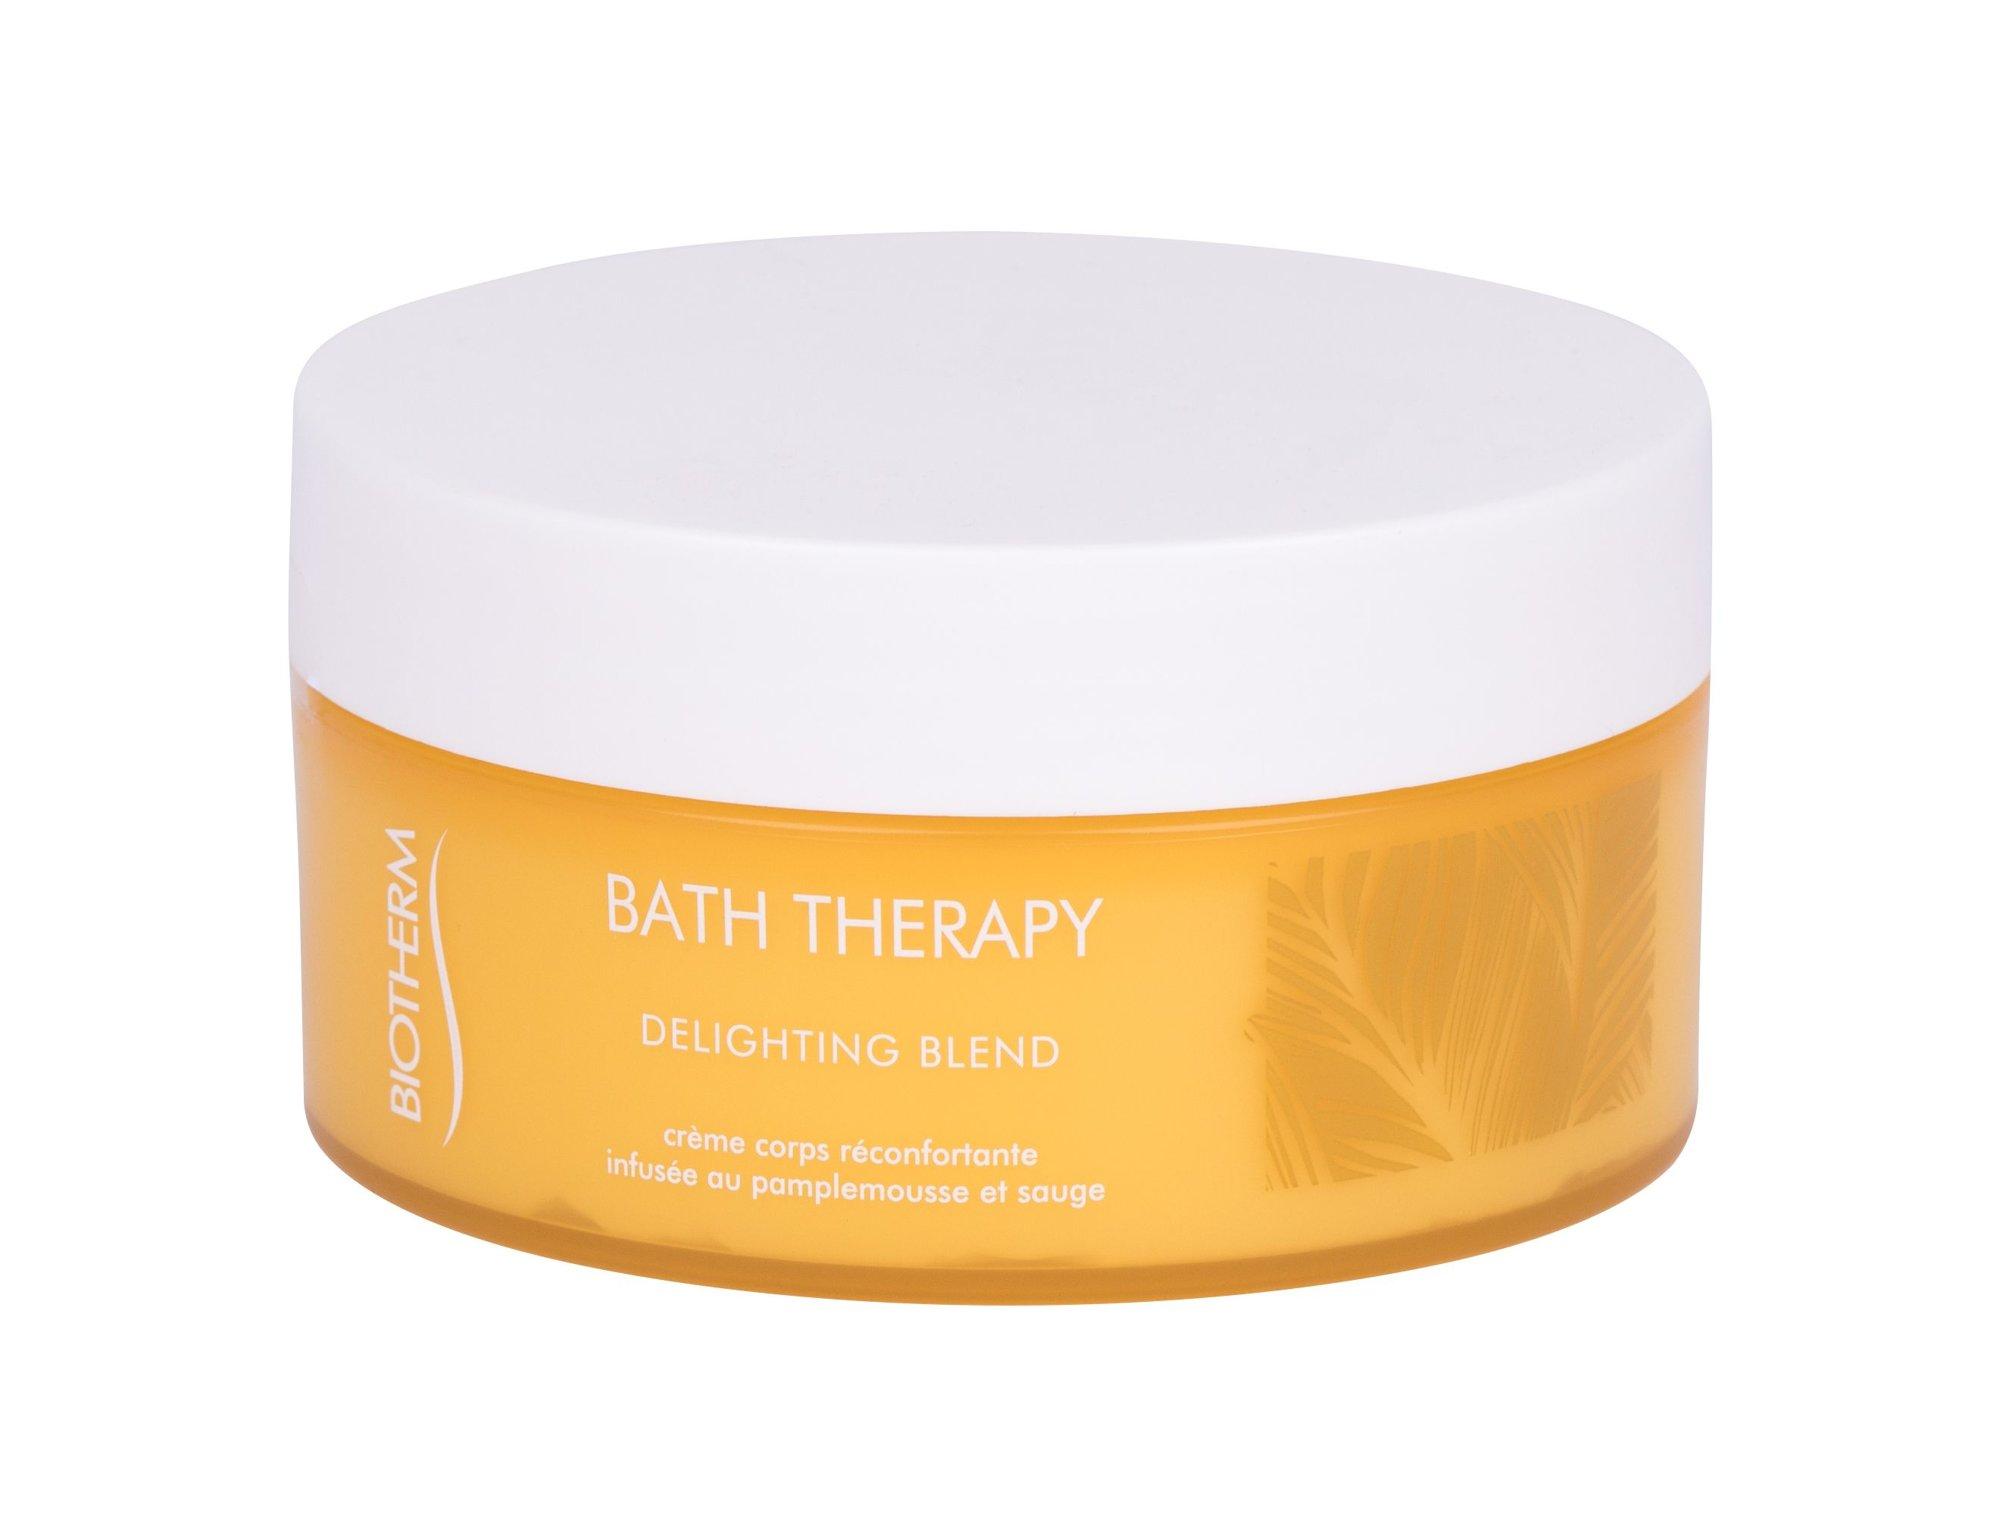 Biotherm Bath Therapy Body Cream 200ml